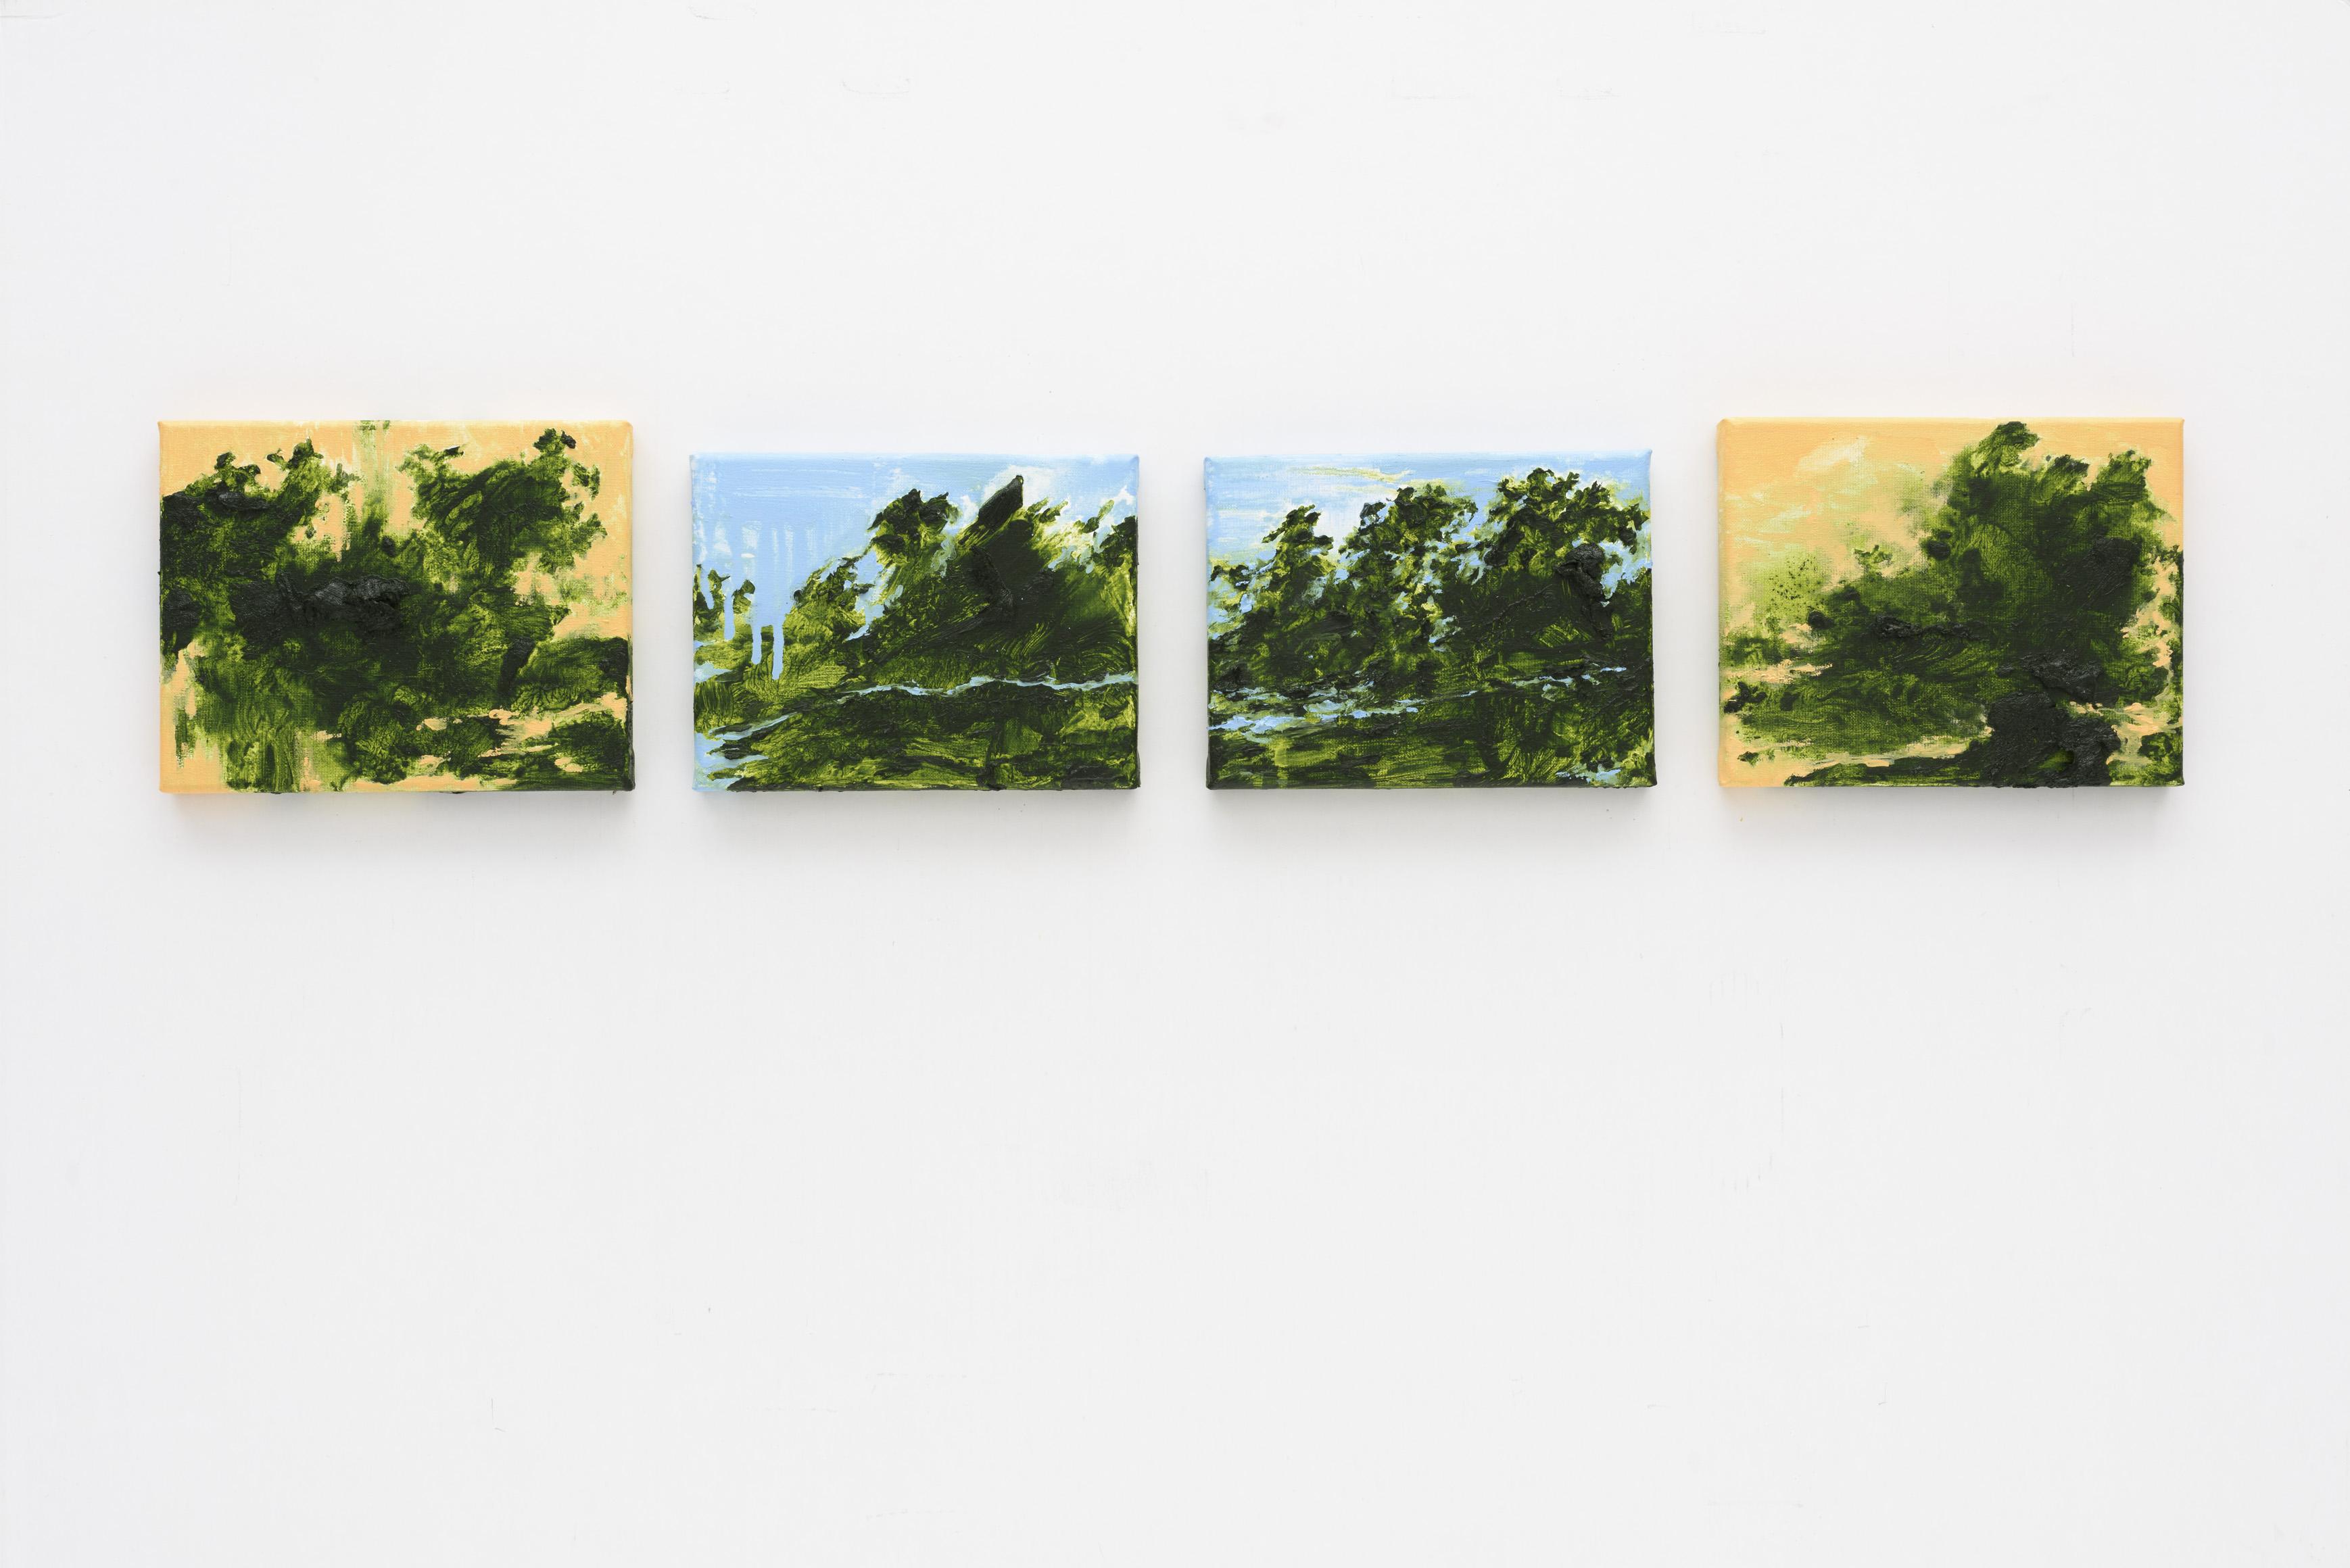 """Floresta de Primavera I, II, III, IV"" 20x25, 18x24, 18x24, 20x25 cm. oil on linen 2015"